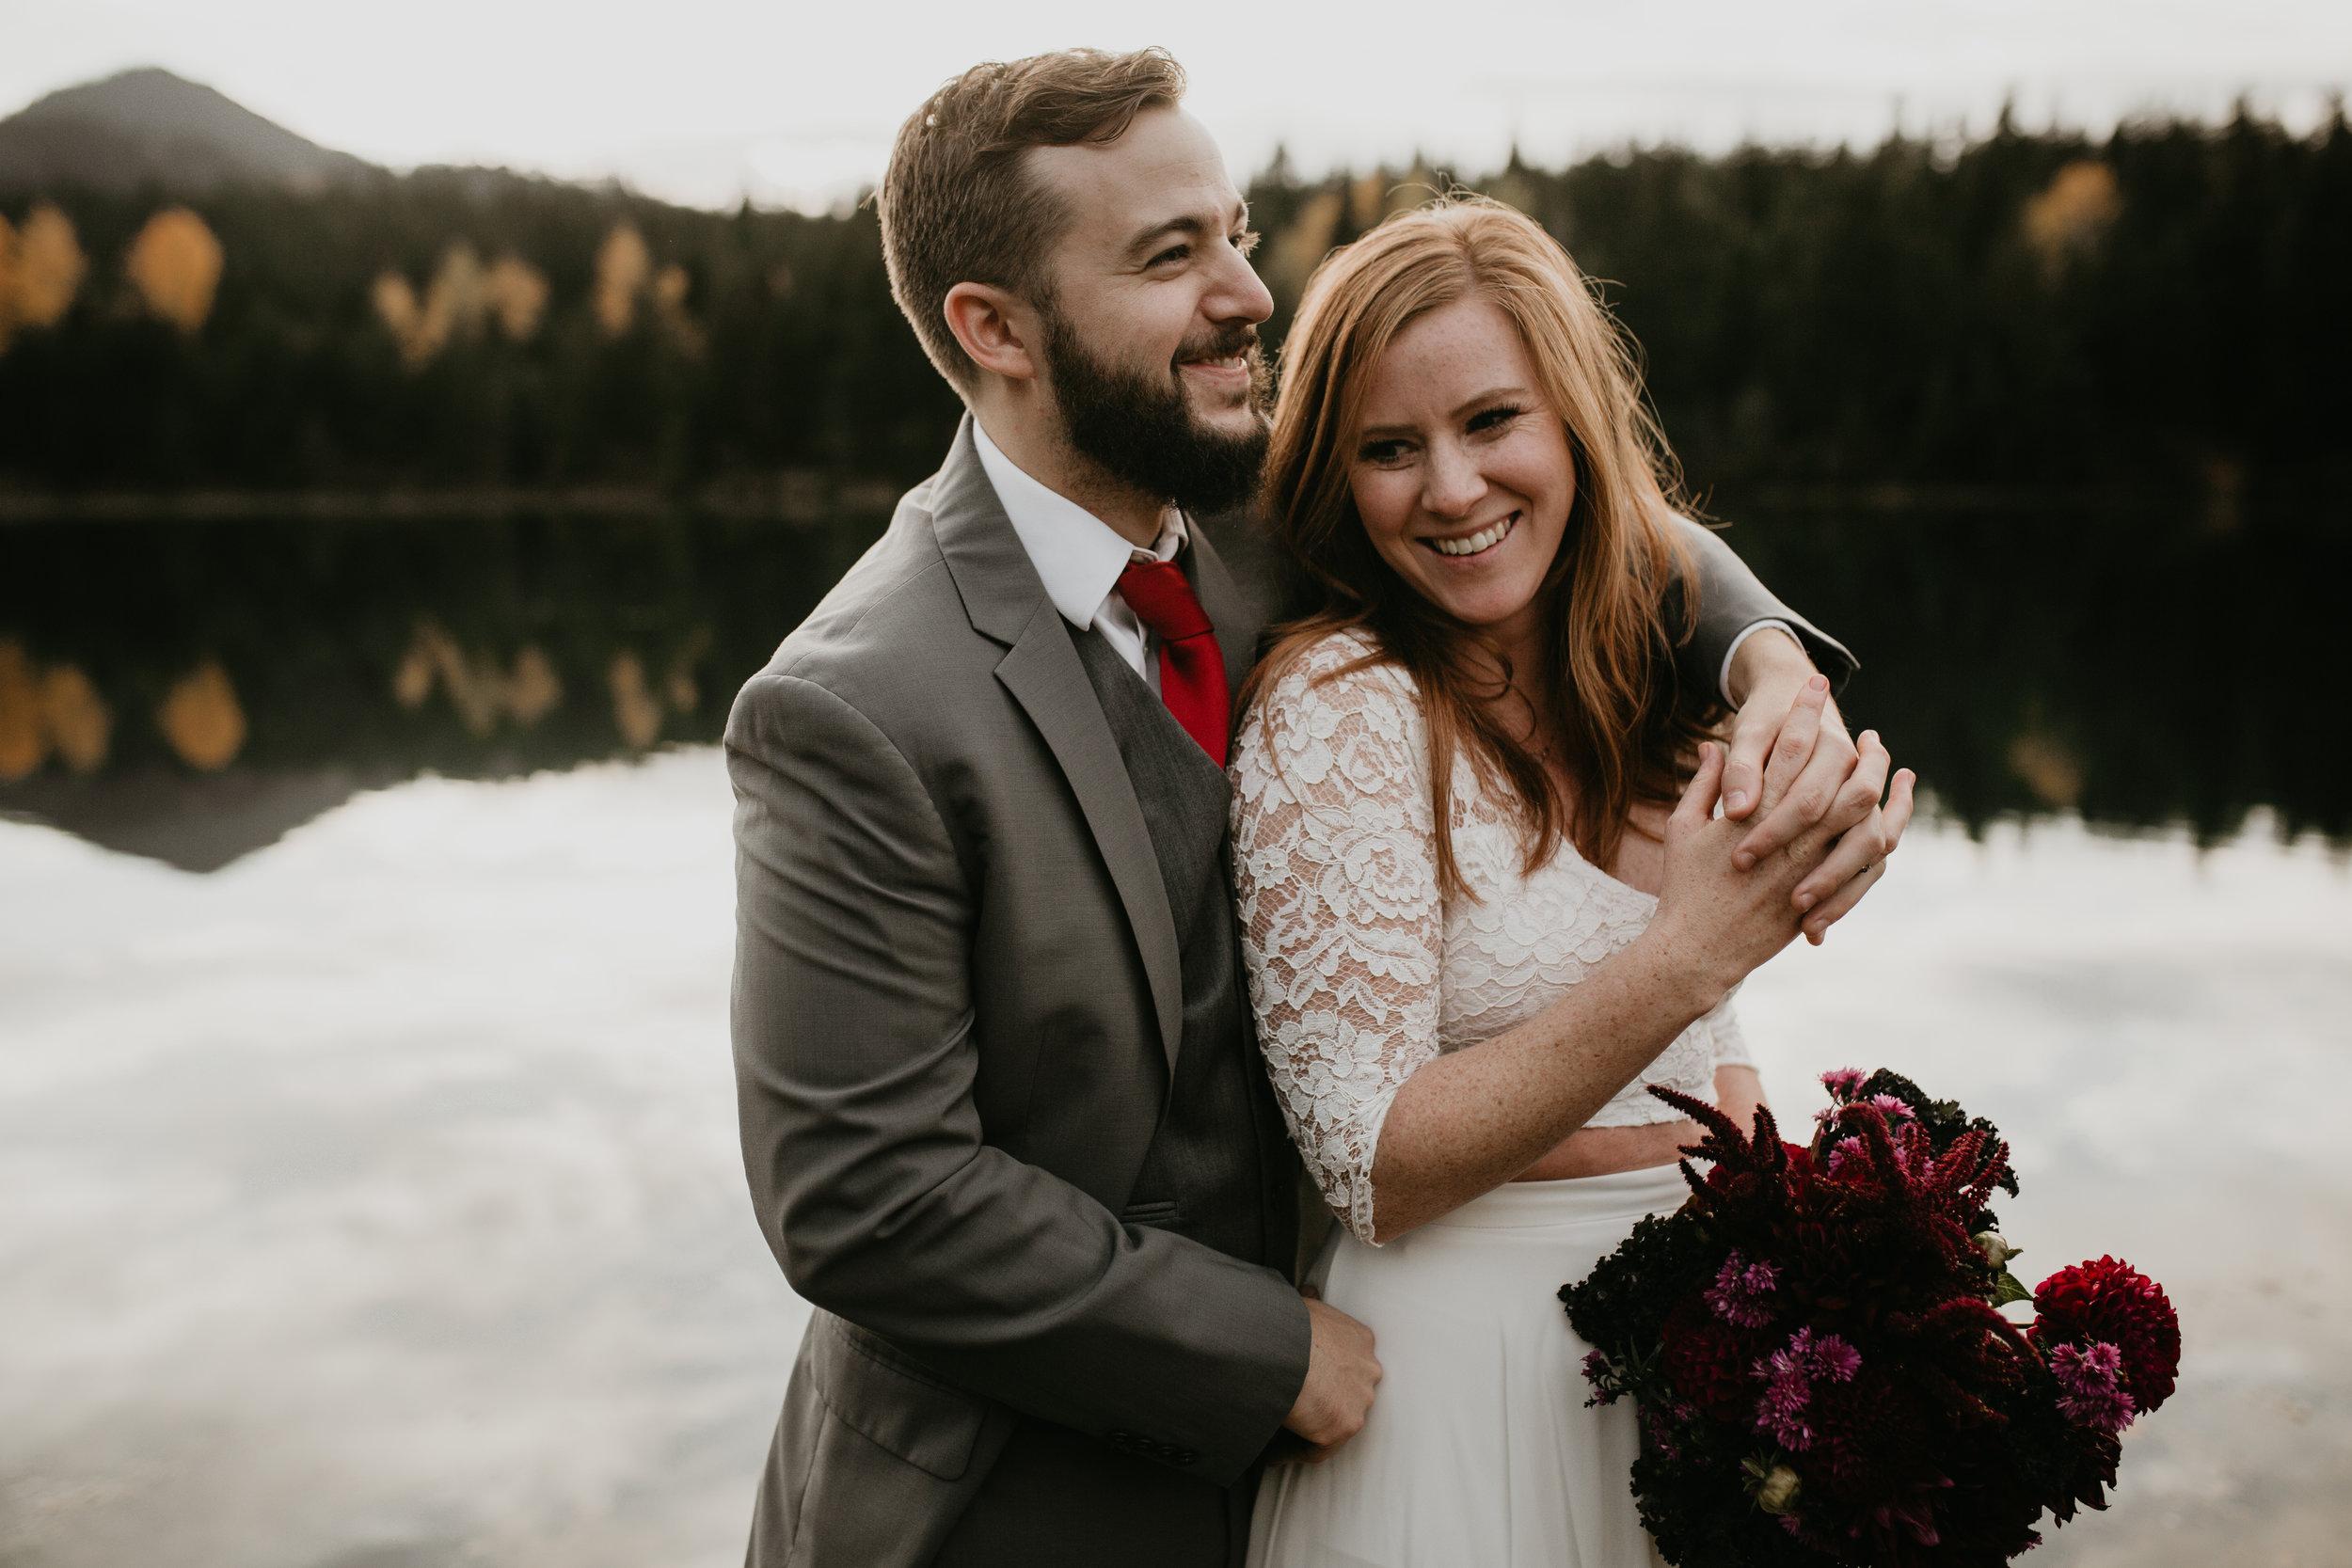 nicole-daacke-photography-mountain-view-elopement-at-gold-creek-pond-snoqualmie-washington-wa-elopement-photographer-photography-adventure-elopement-in-washington-fall-lakeside-golden-sunset-boho-fun-bride-0484.jpg